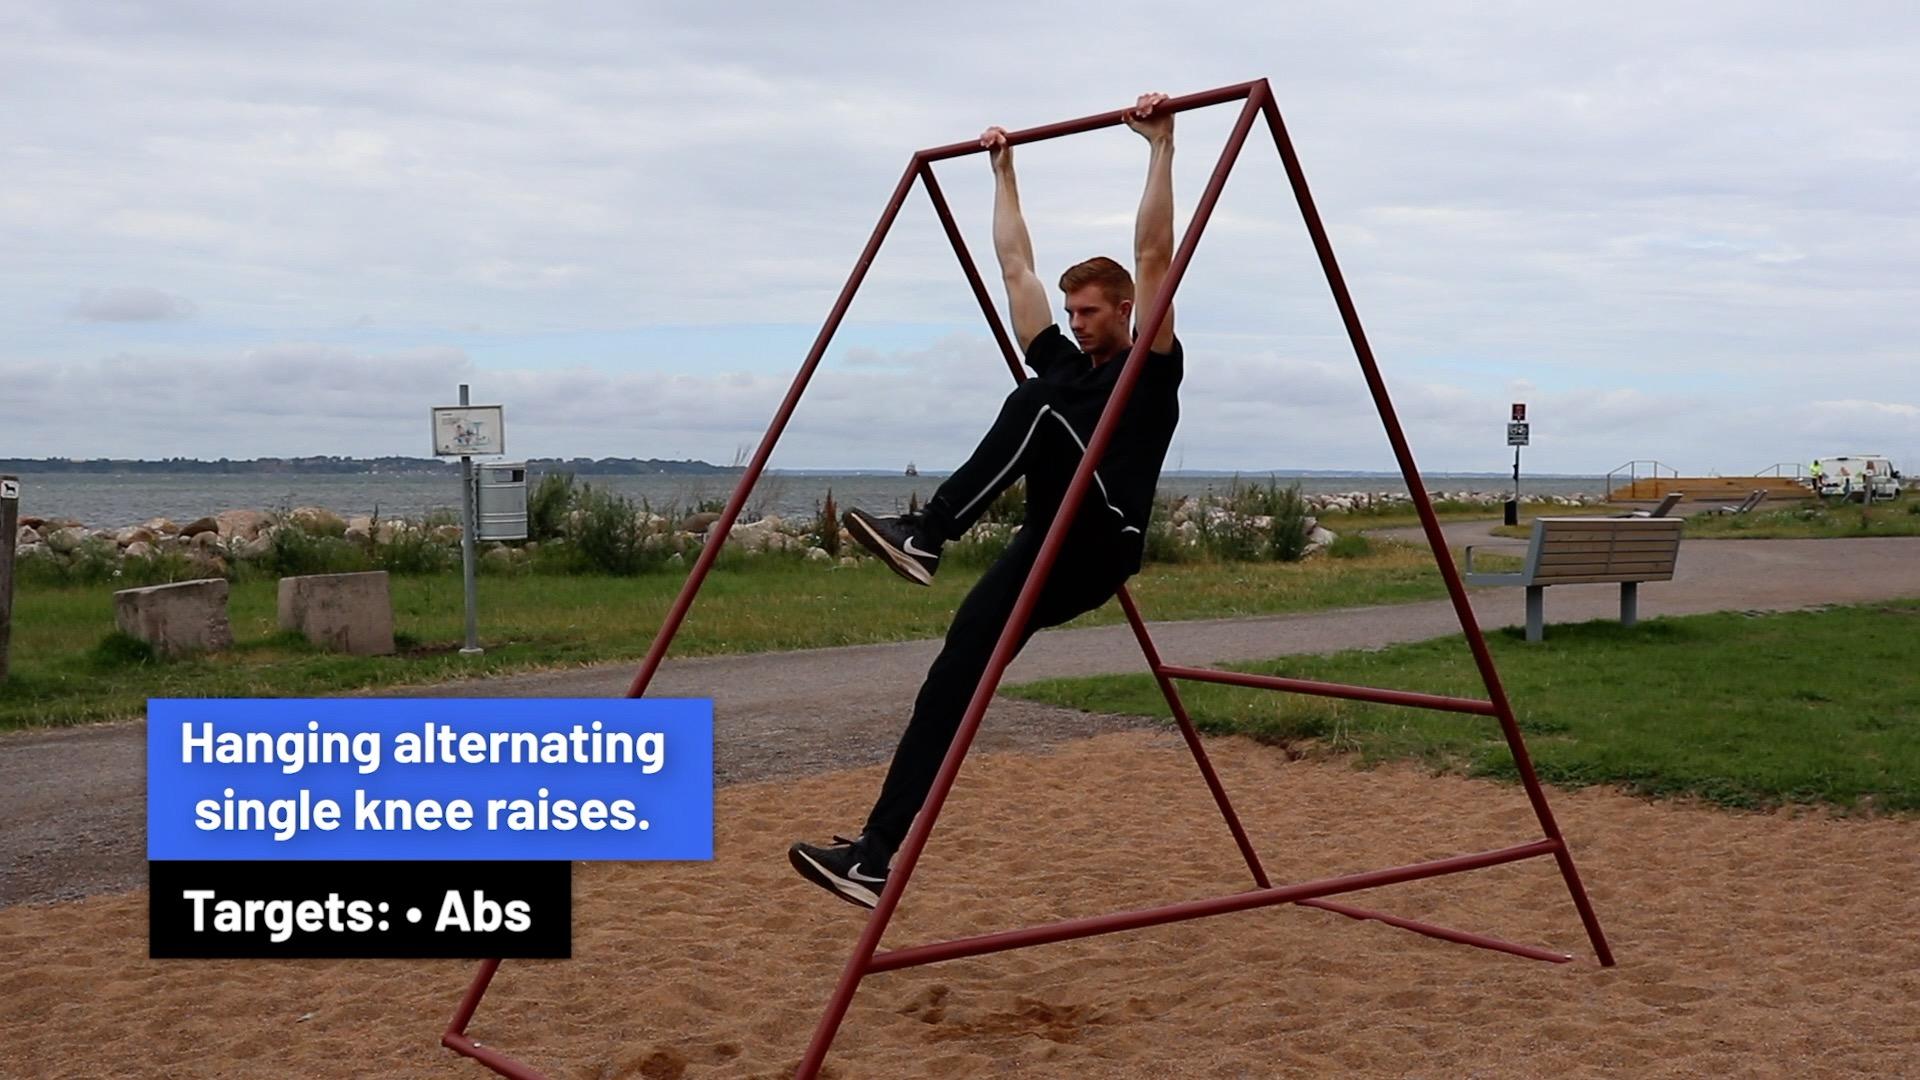 Hanging alternating single knee raises